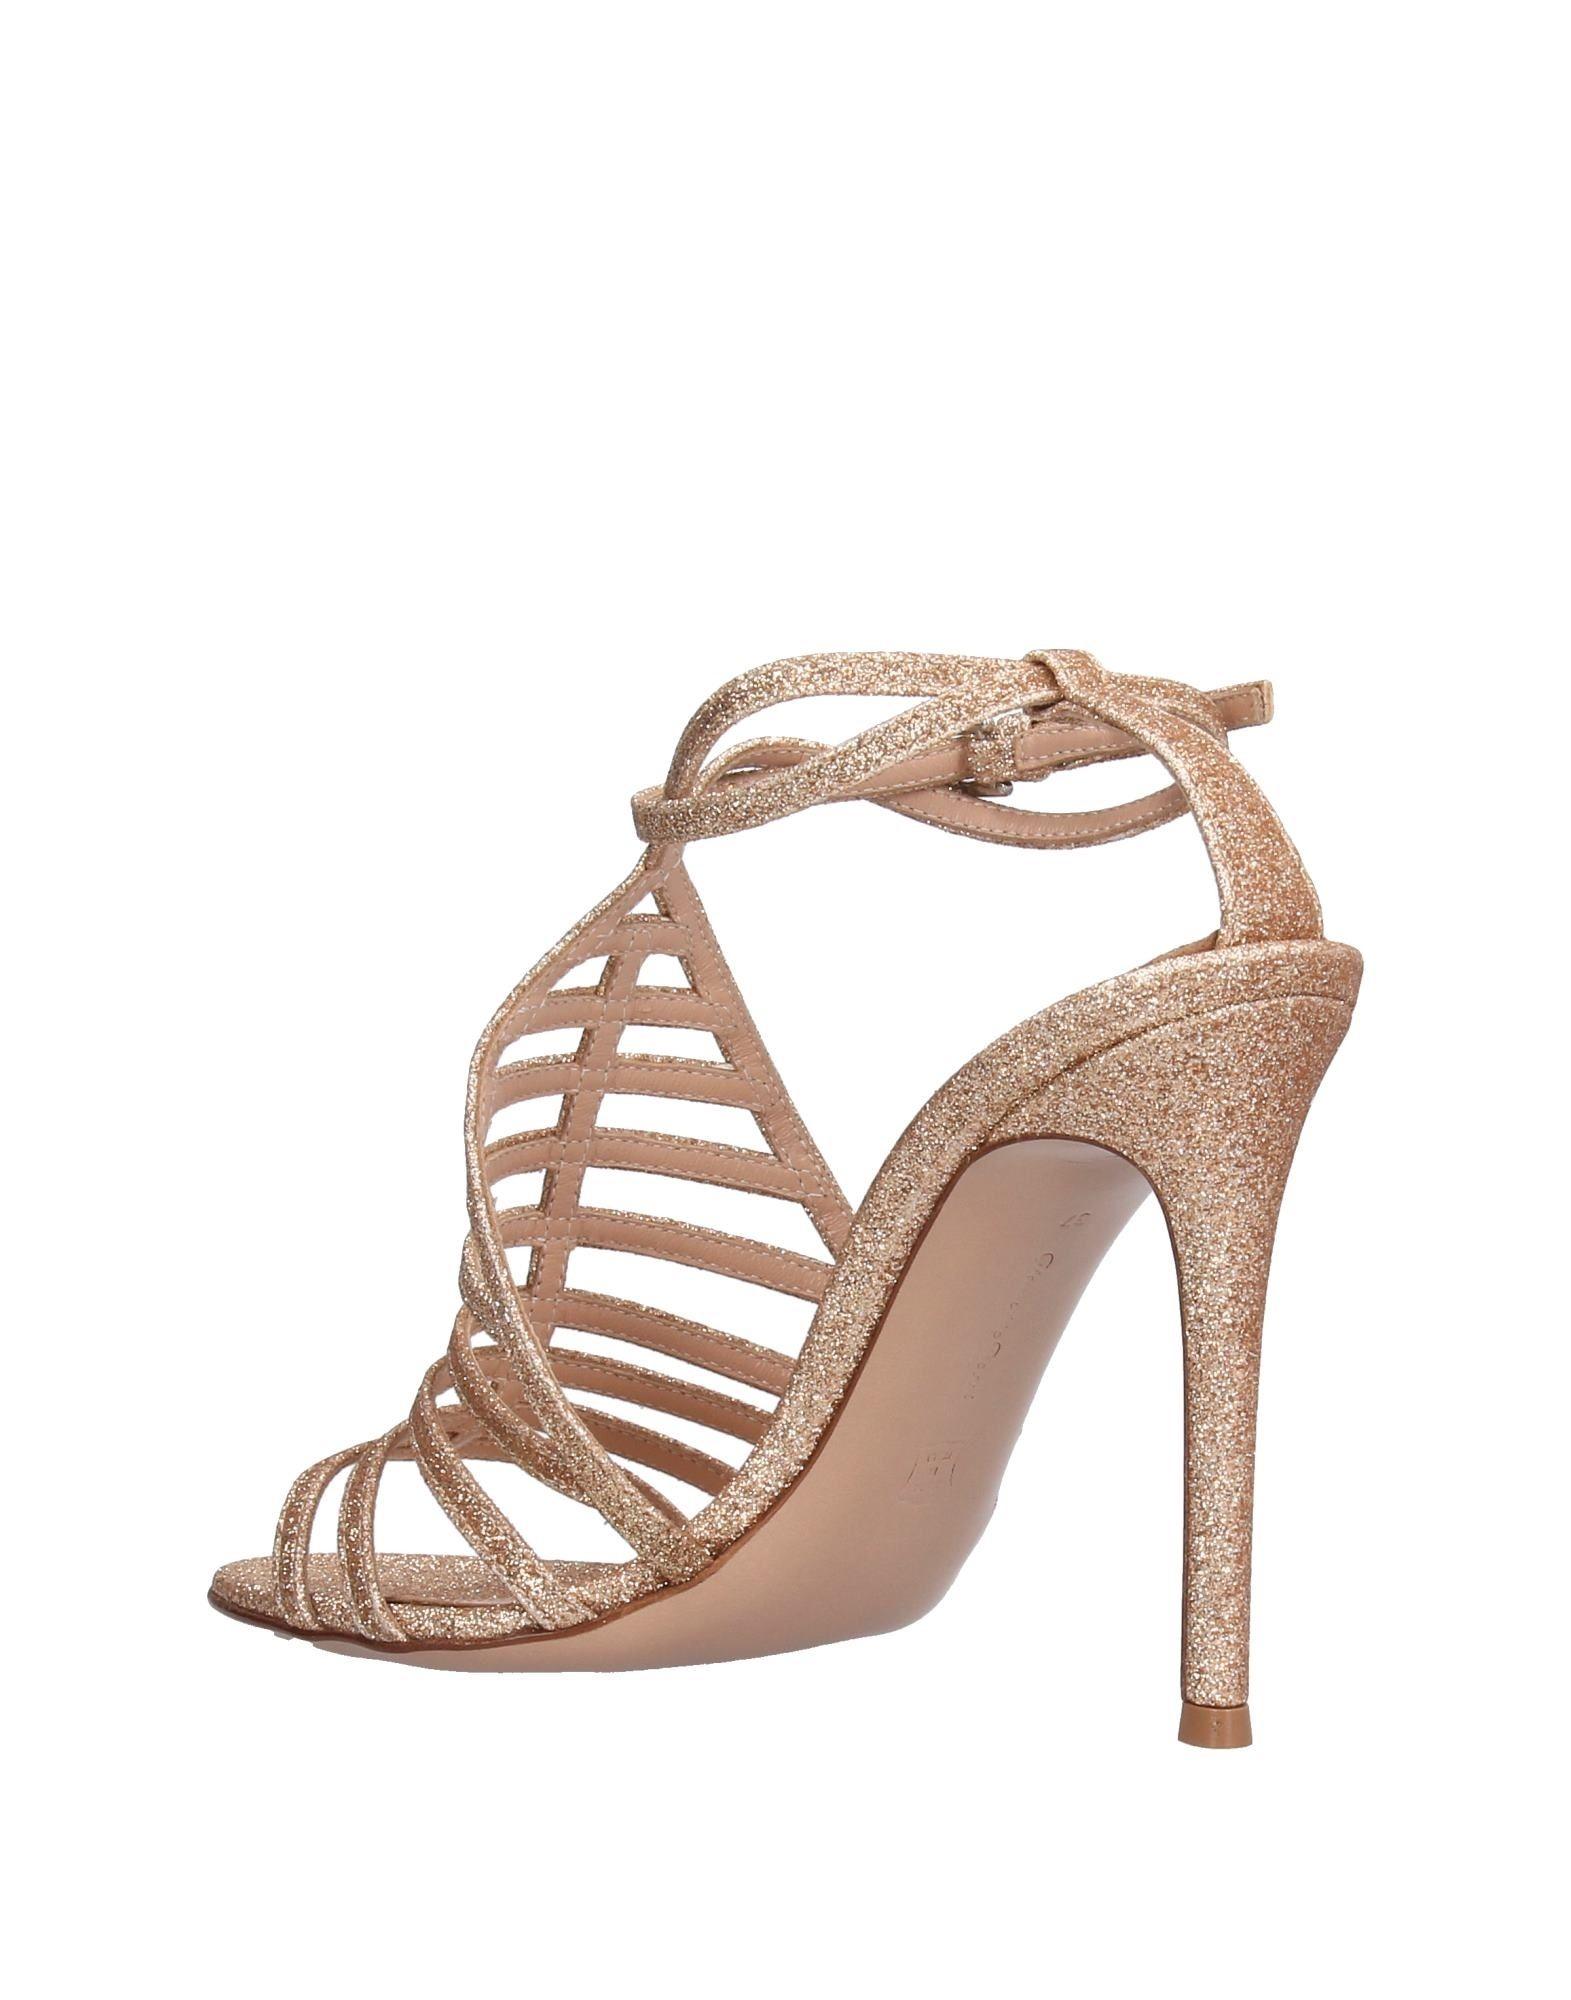 Gianvito Rossi gut Sandalen Damen  11211003WBGünstige gut Rossi aussehende Schuhe 72e72d